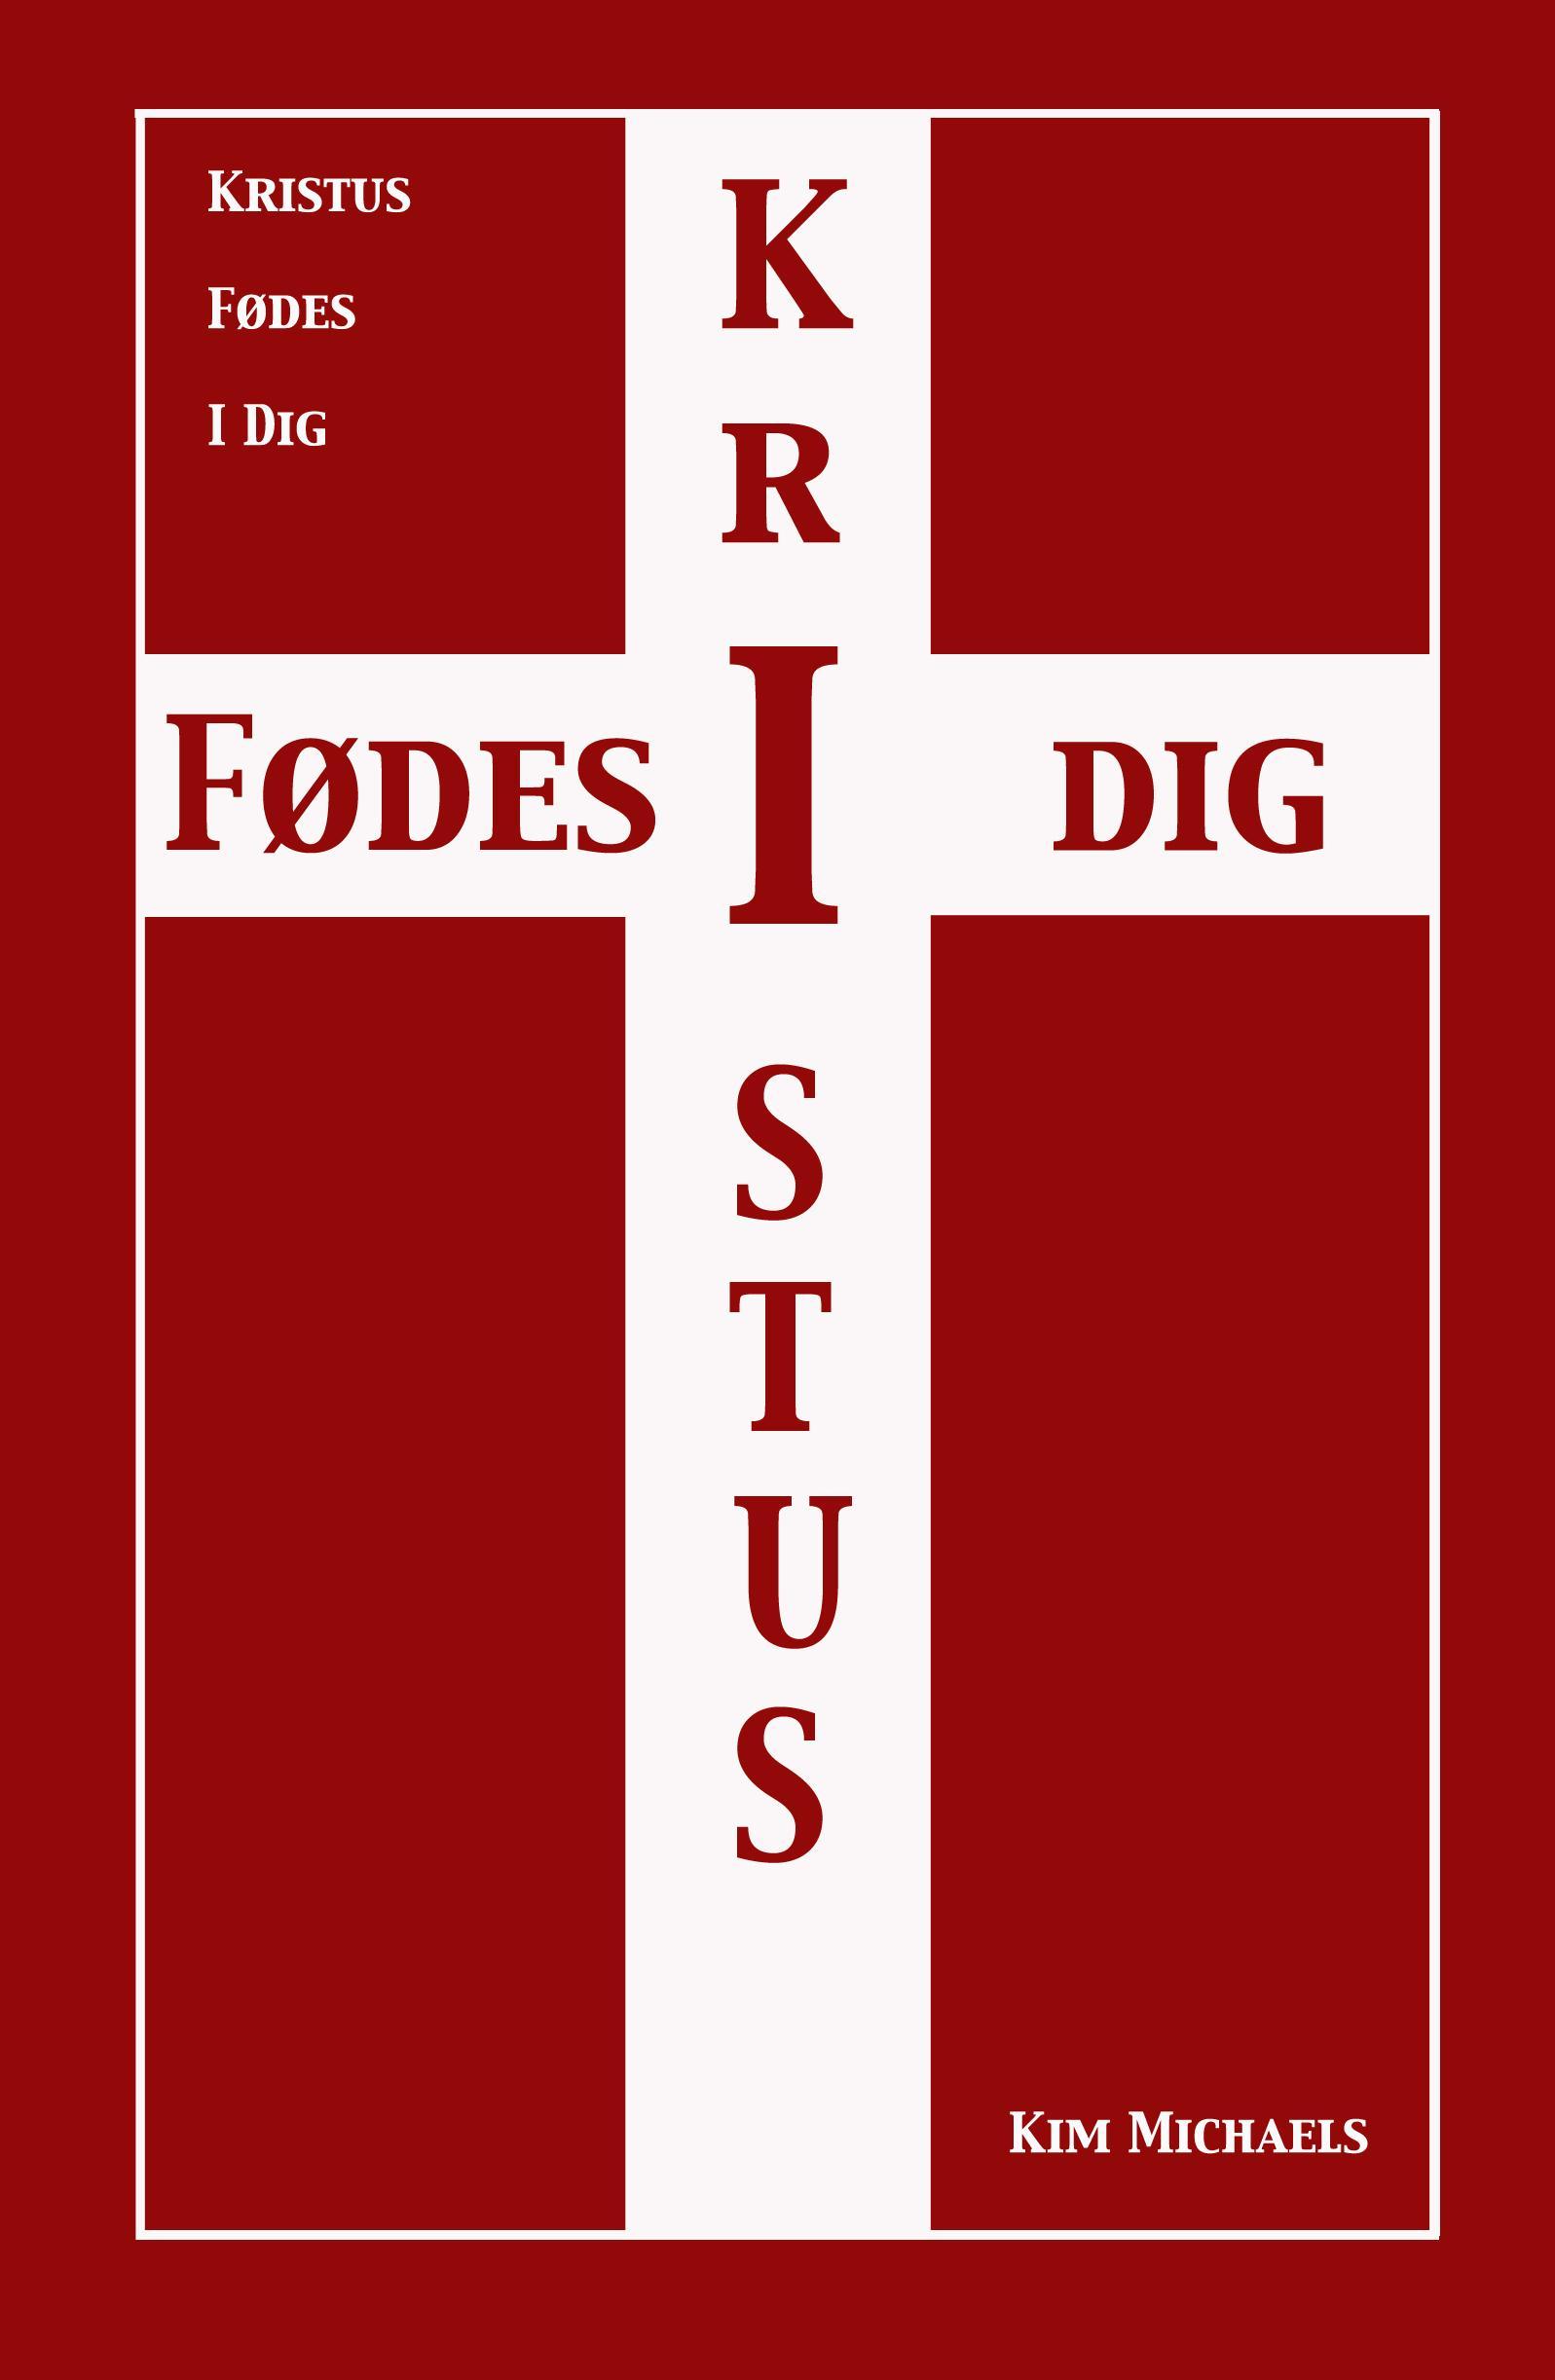 Kristus F?des I Dig EB9789949921515